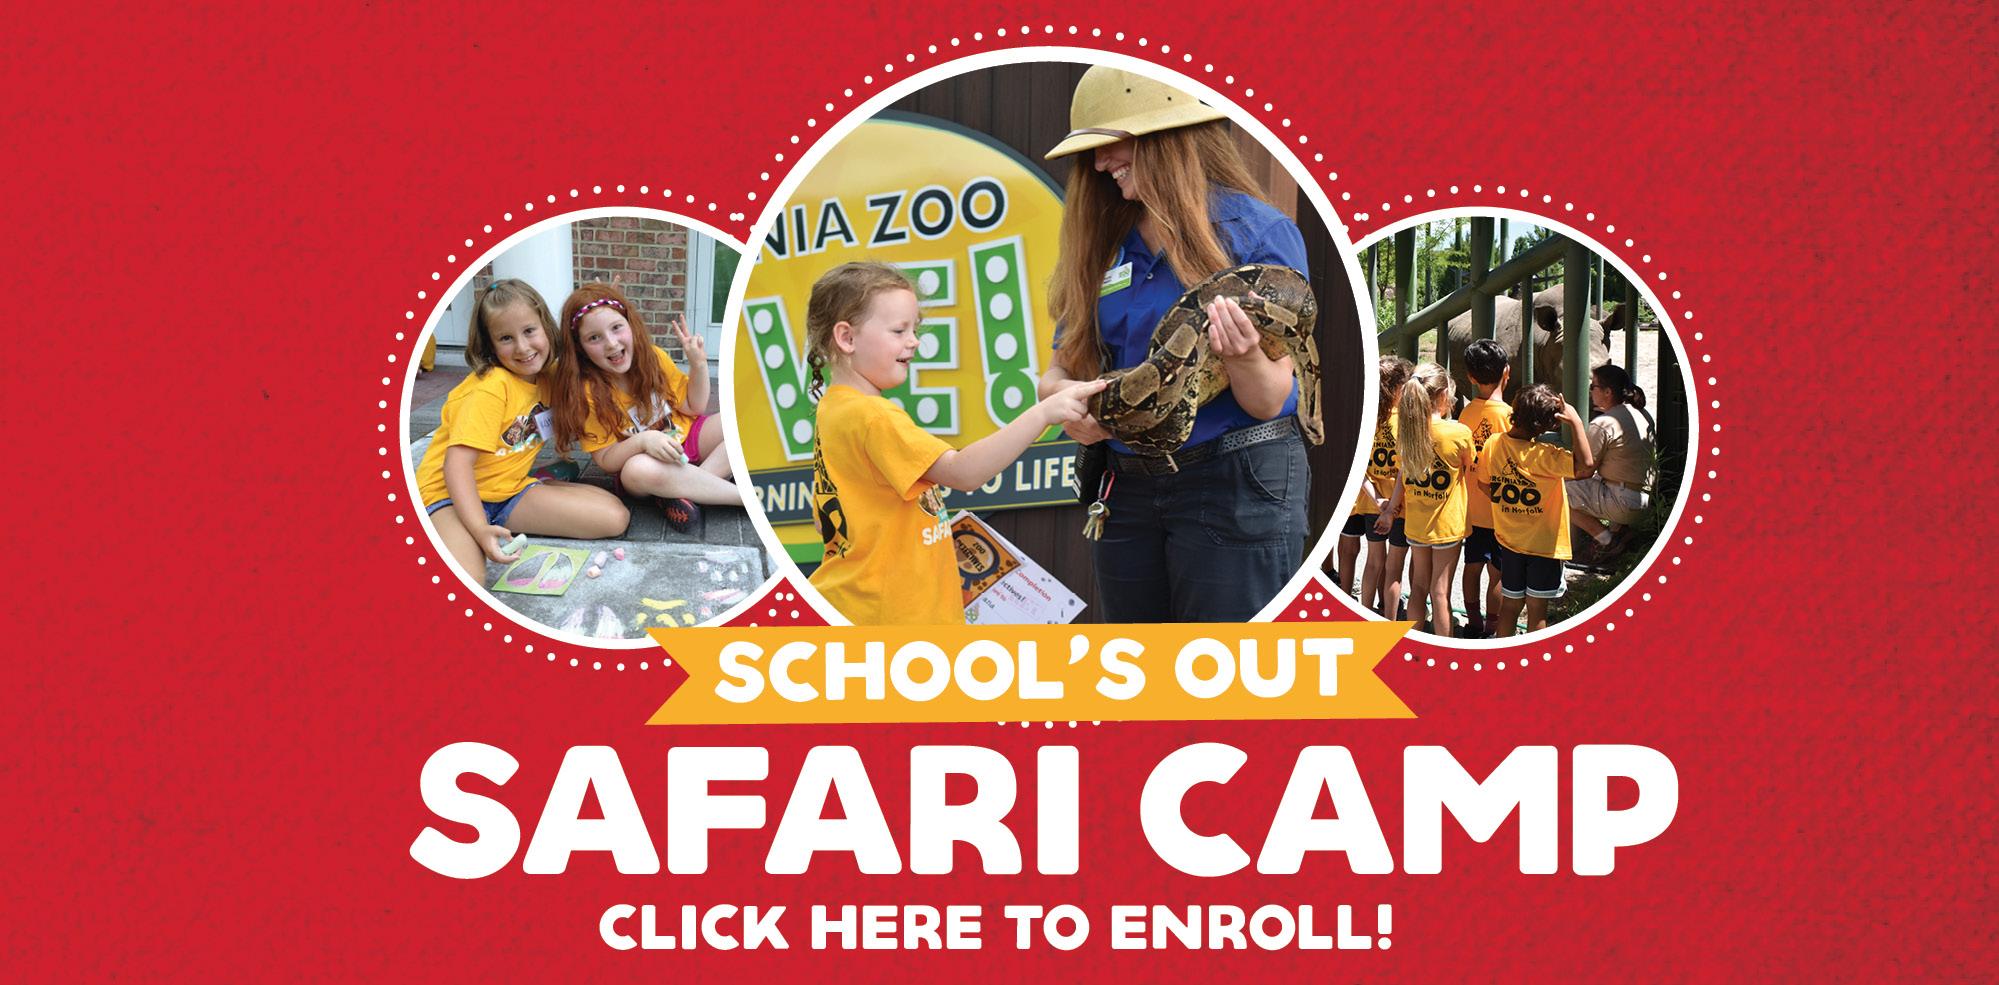 VAZOO_Summer Camp_homepage banner